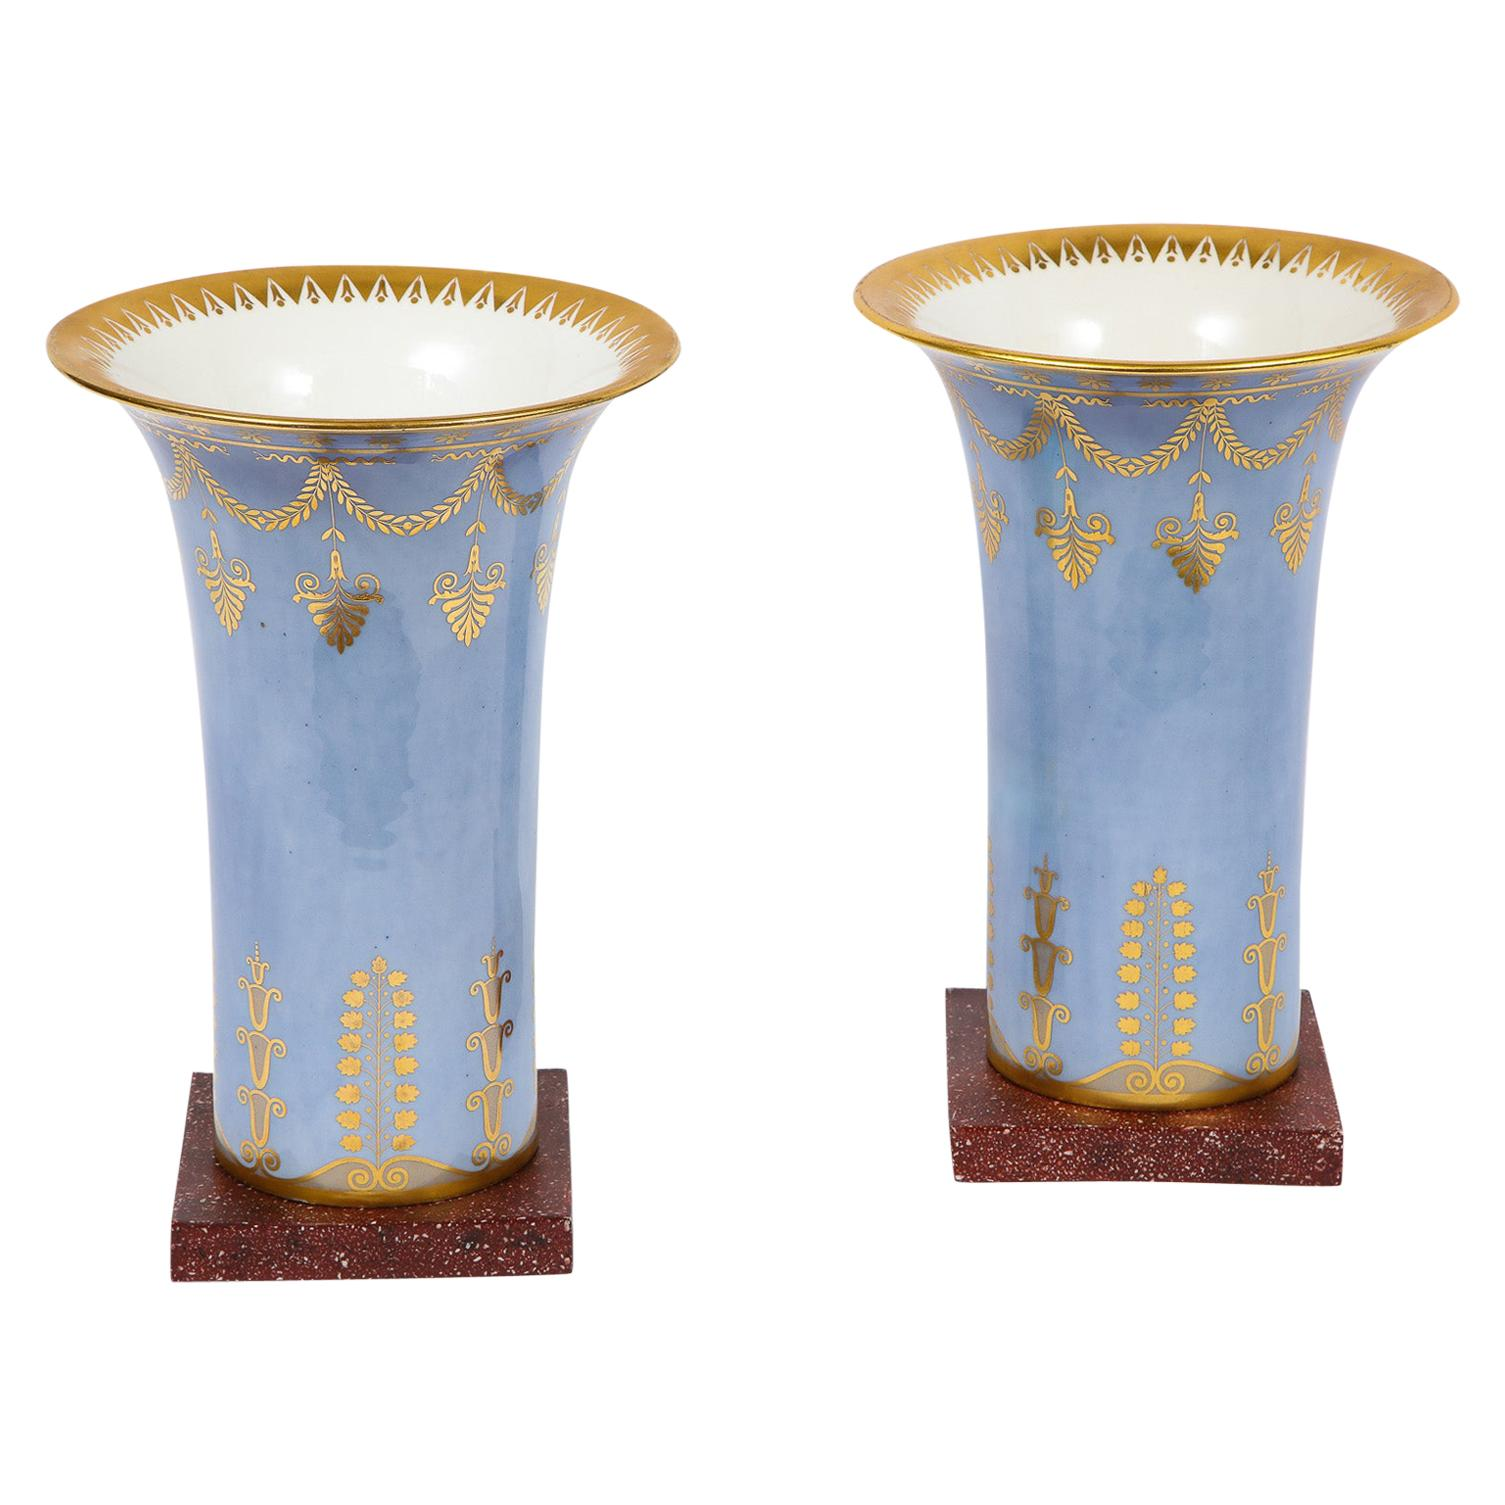 Pair of Empire Period Sèvres Porcelain Pale Blue and Faux Porphyry Ground Vases